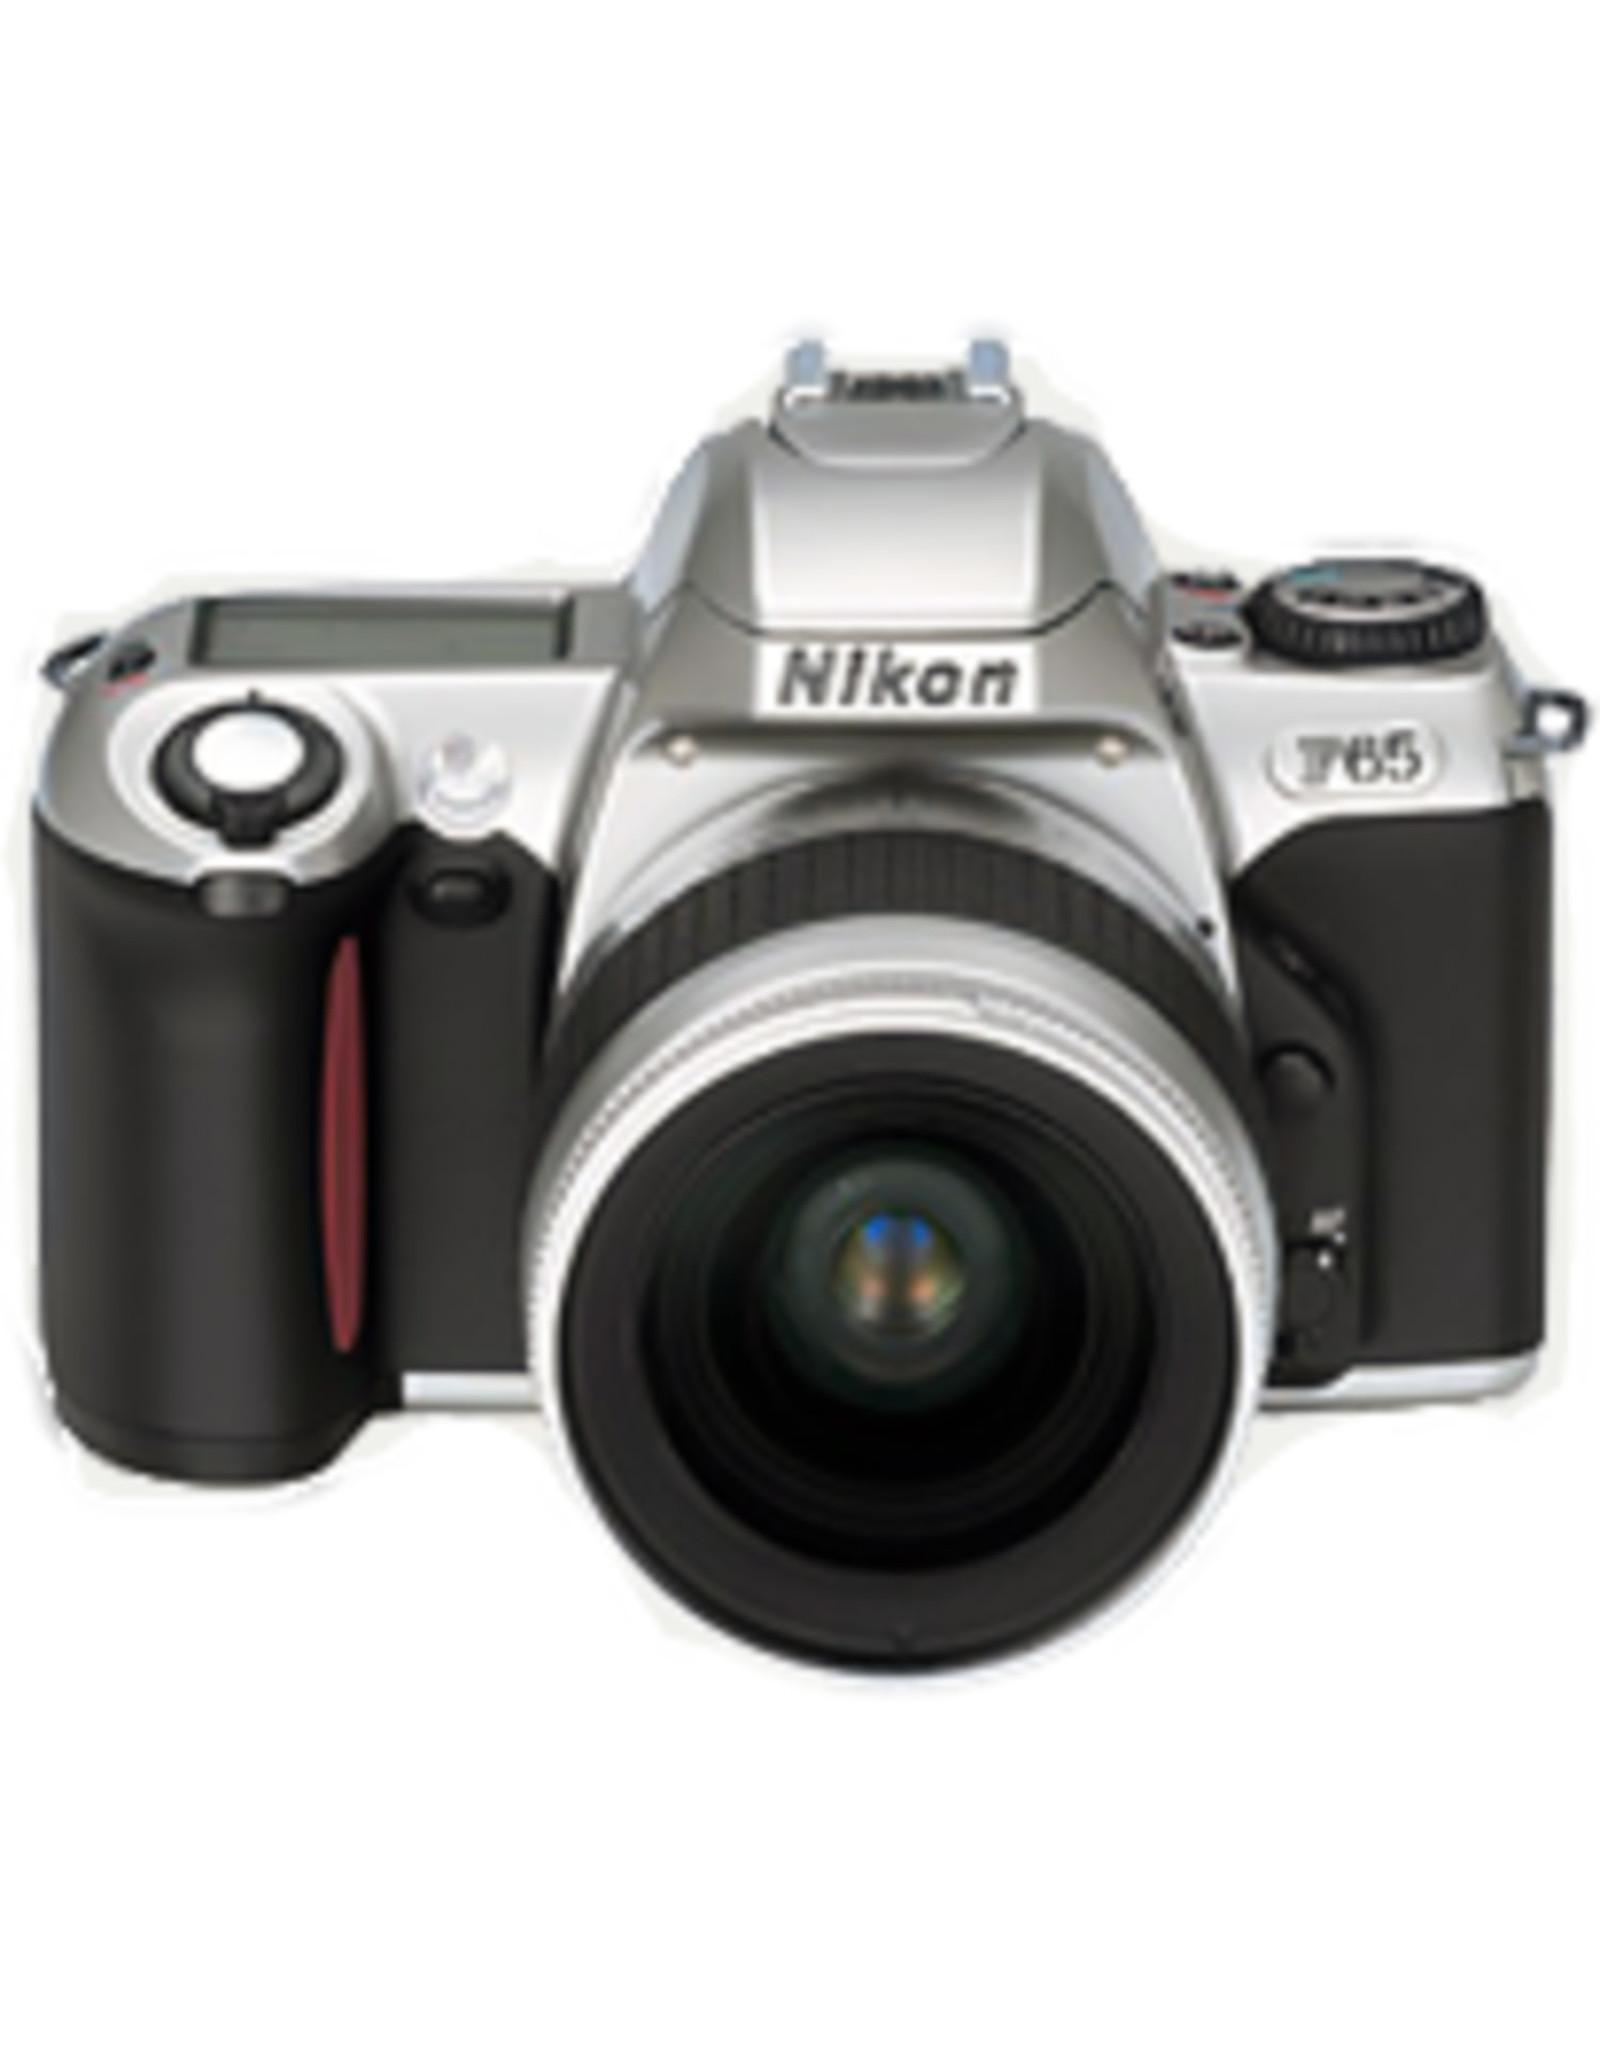 Nikon NIKON N65 35mm SLR w/35-80mm Lens Semester Rental